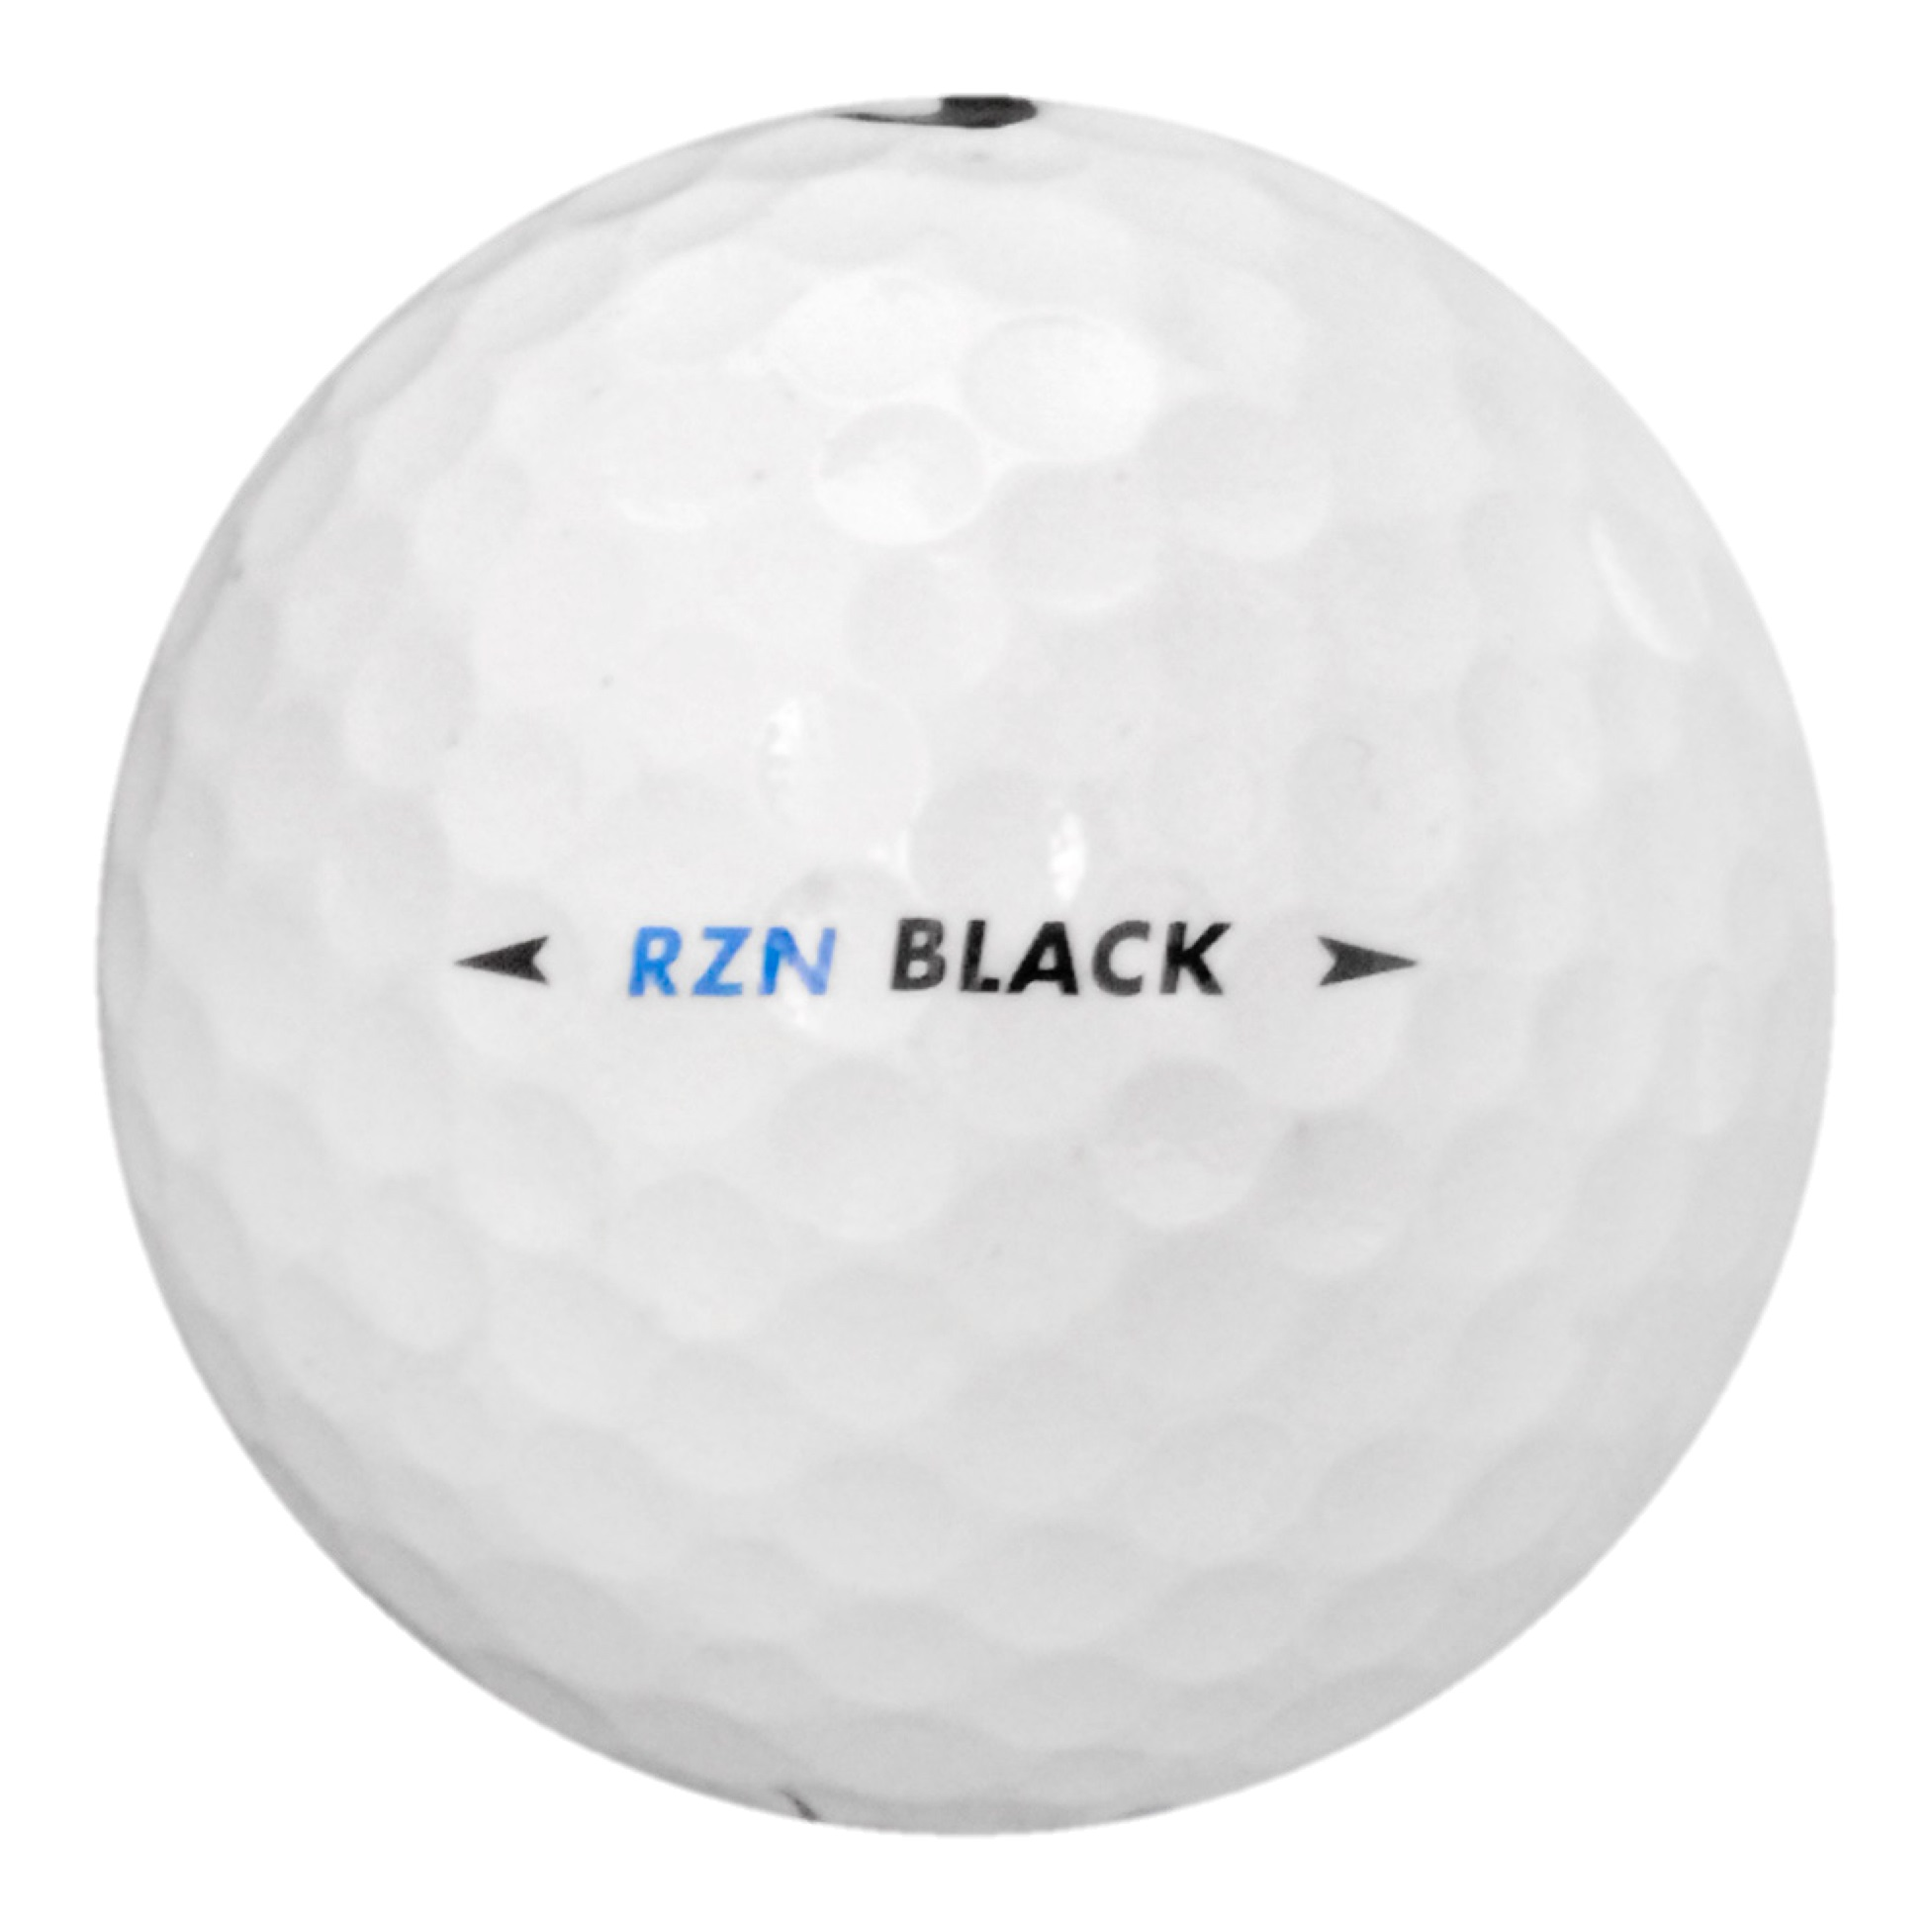 12 Nike RZN Black - Value (AAA) Grade - Recycled (Used) Golf Balls ... e28cf02aa6